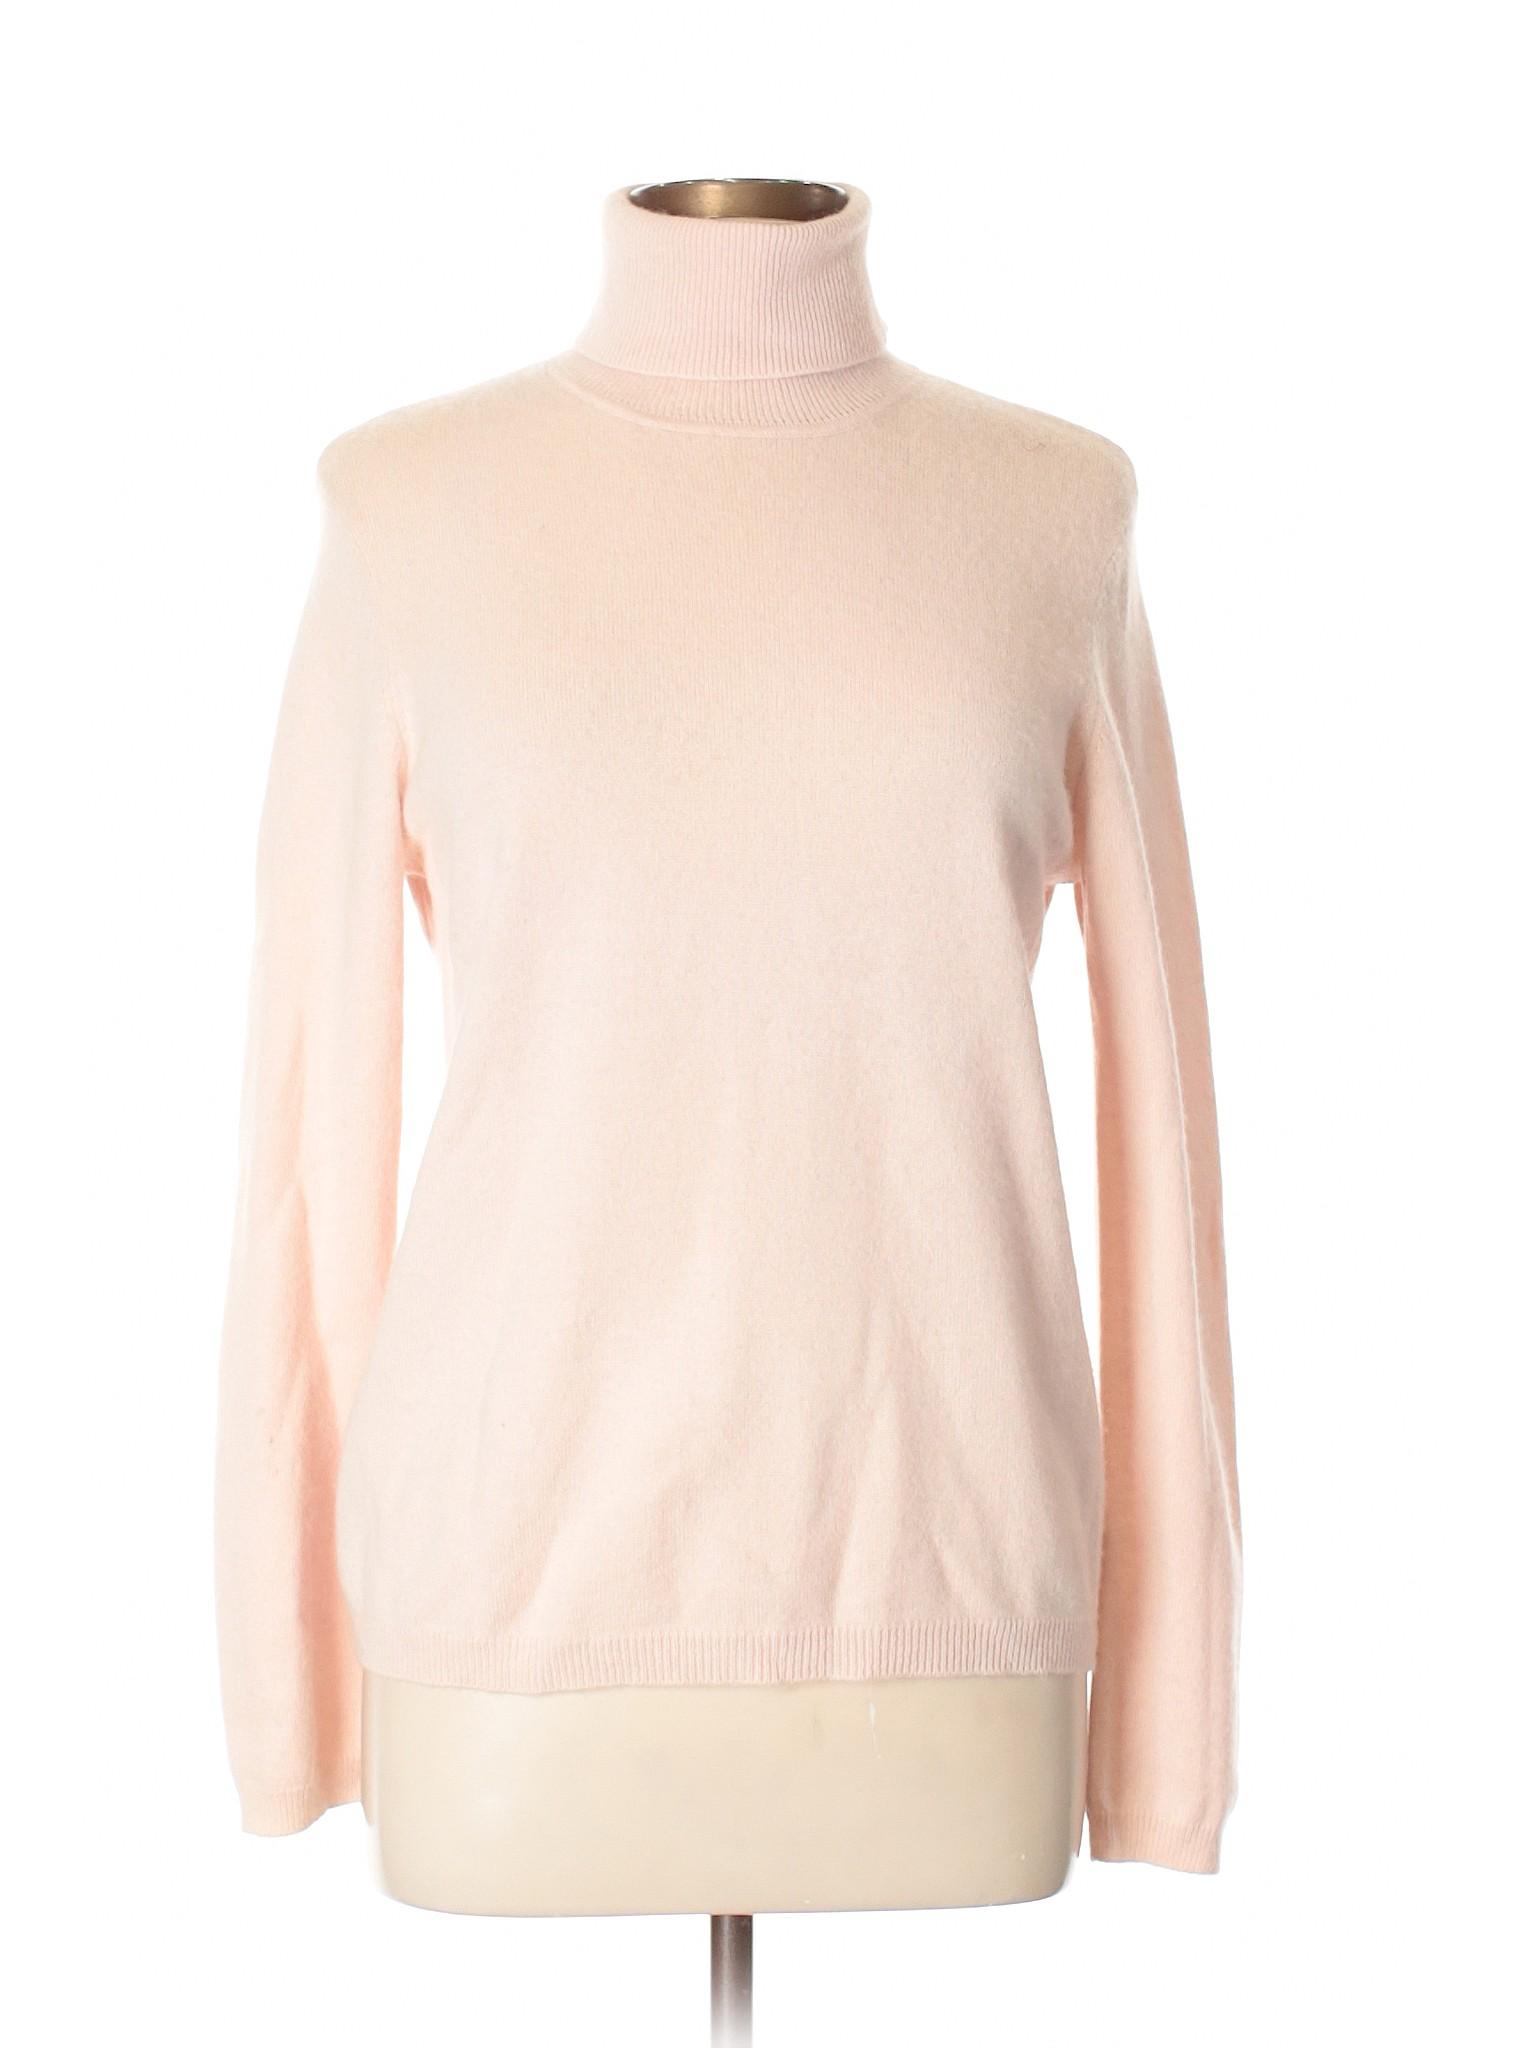 Boutique Sweater Lauren Pullover Ralph Lauren Cashmere by qw7gOSf7x